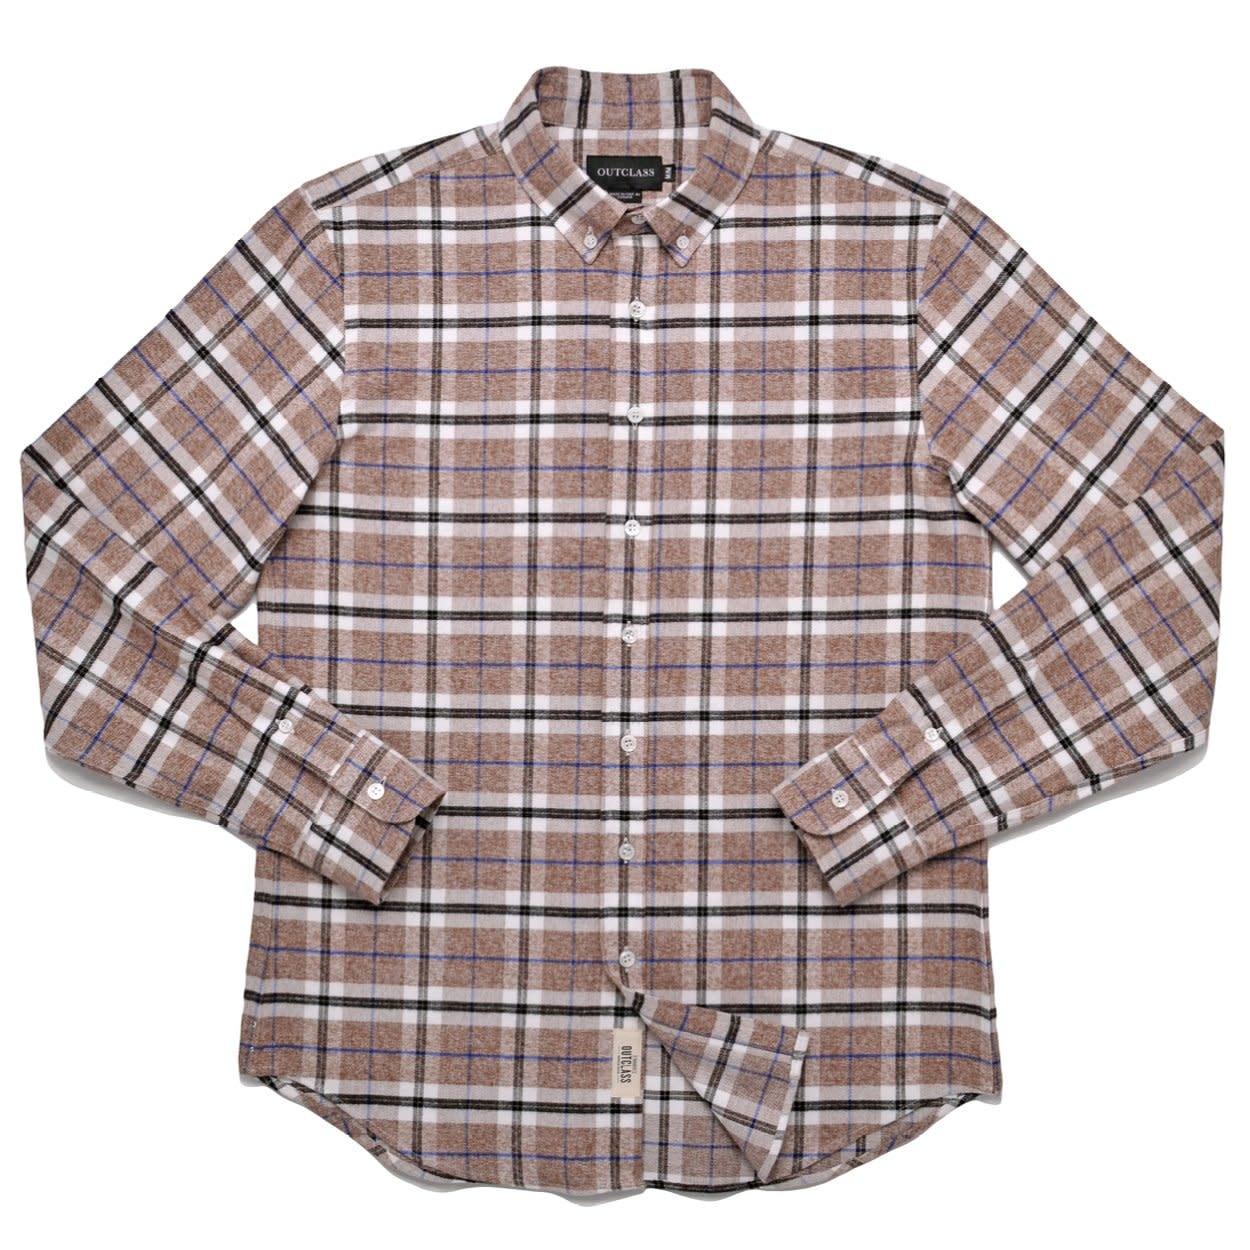 Outclass Flannel Shirt